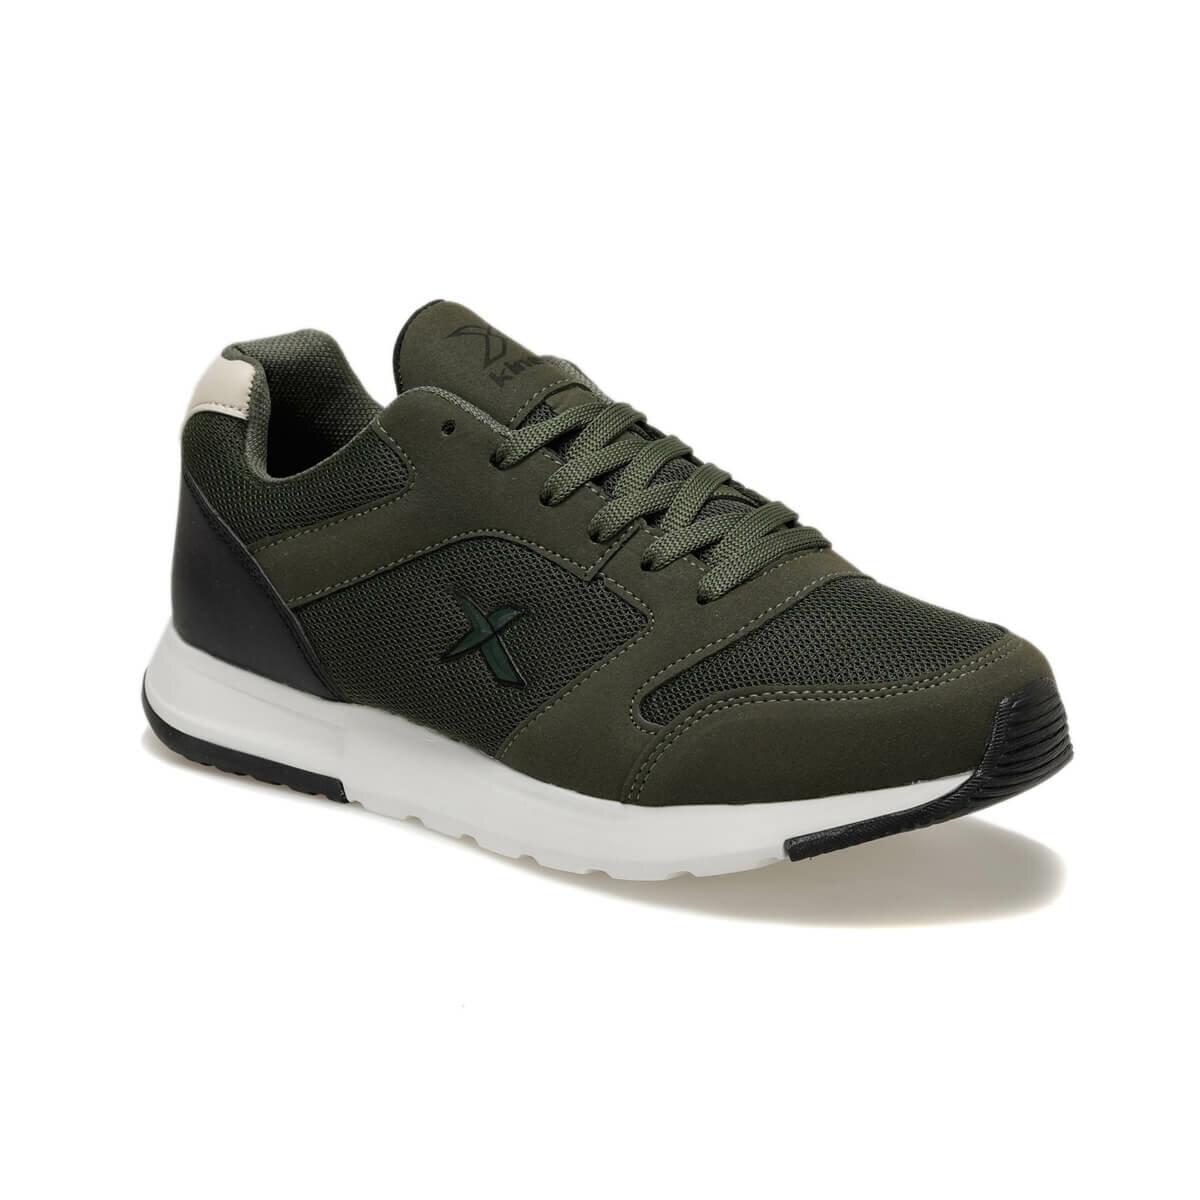 FLO FLAT M Khaki Men 'S Sneaker Shoes KINETIX